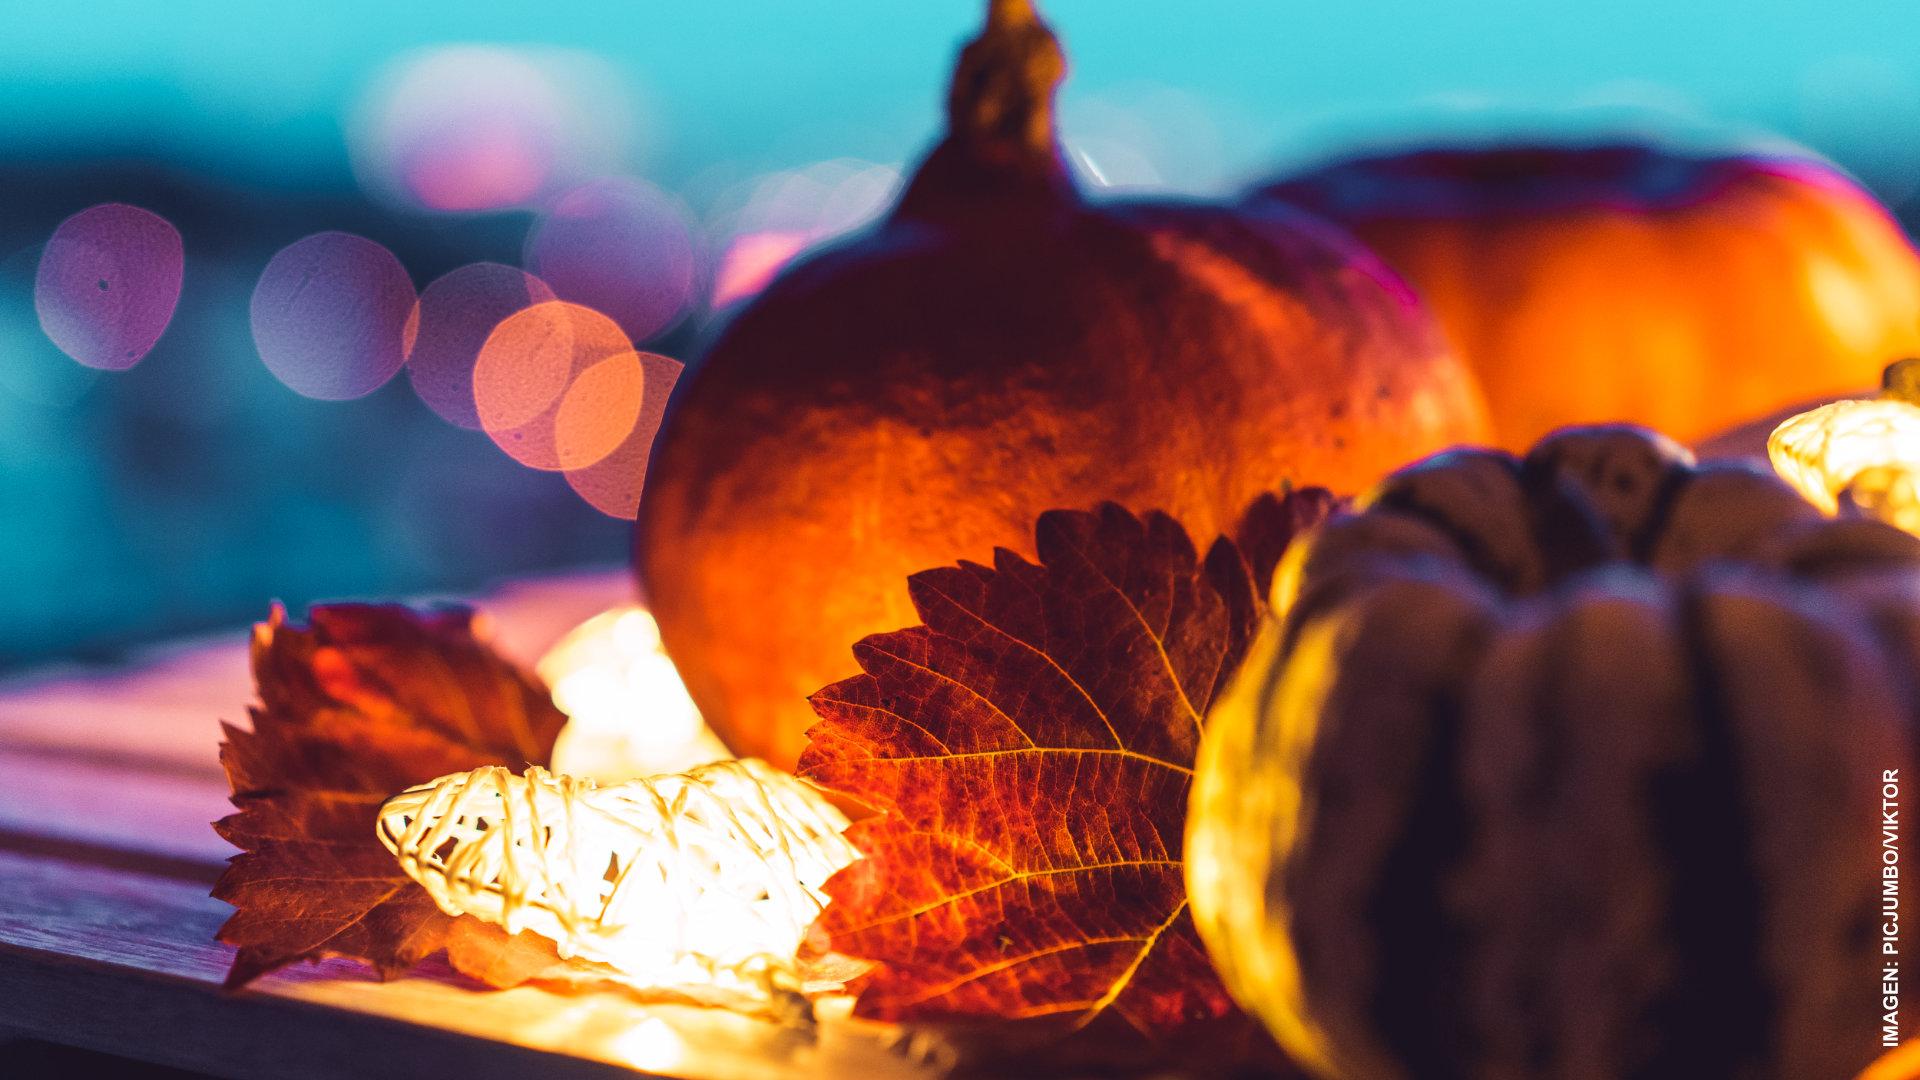 Autorizan en Quebec celebrar Halloween